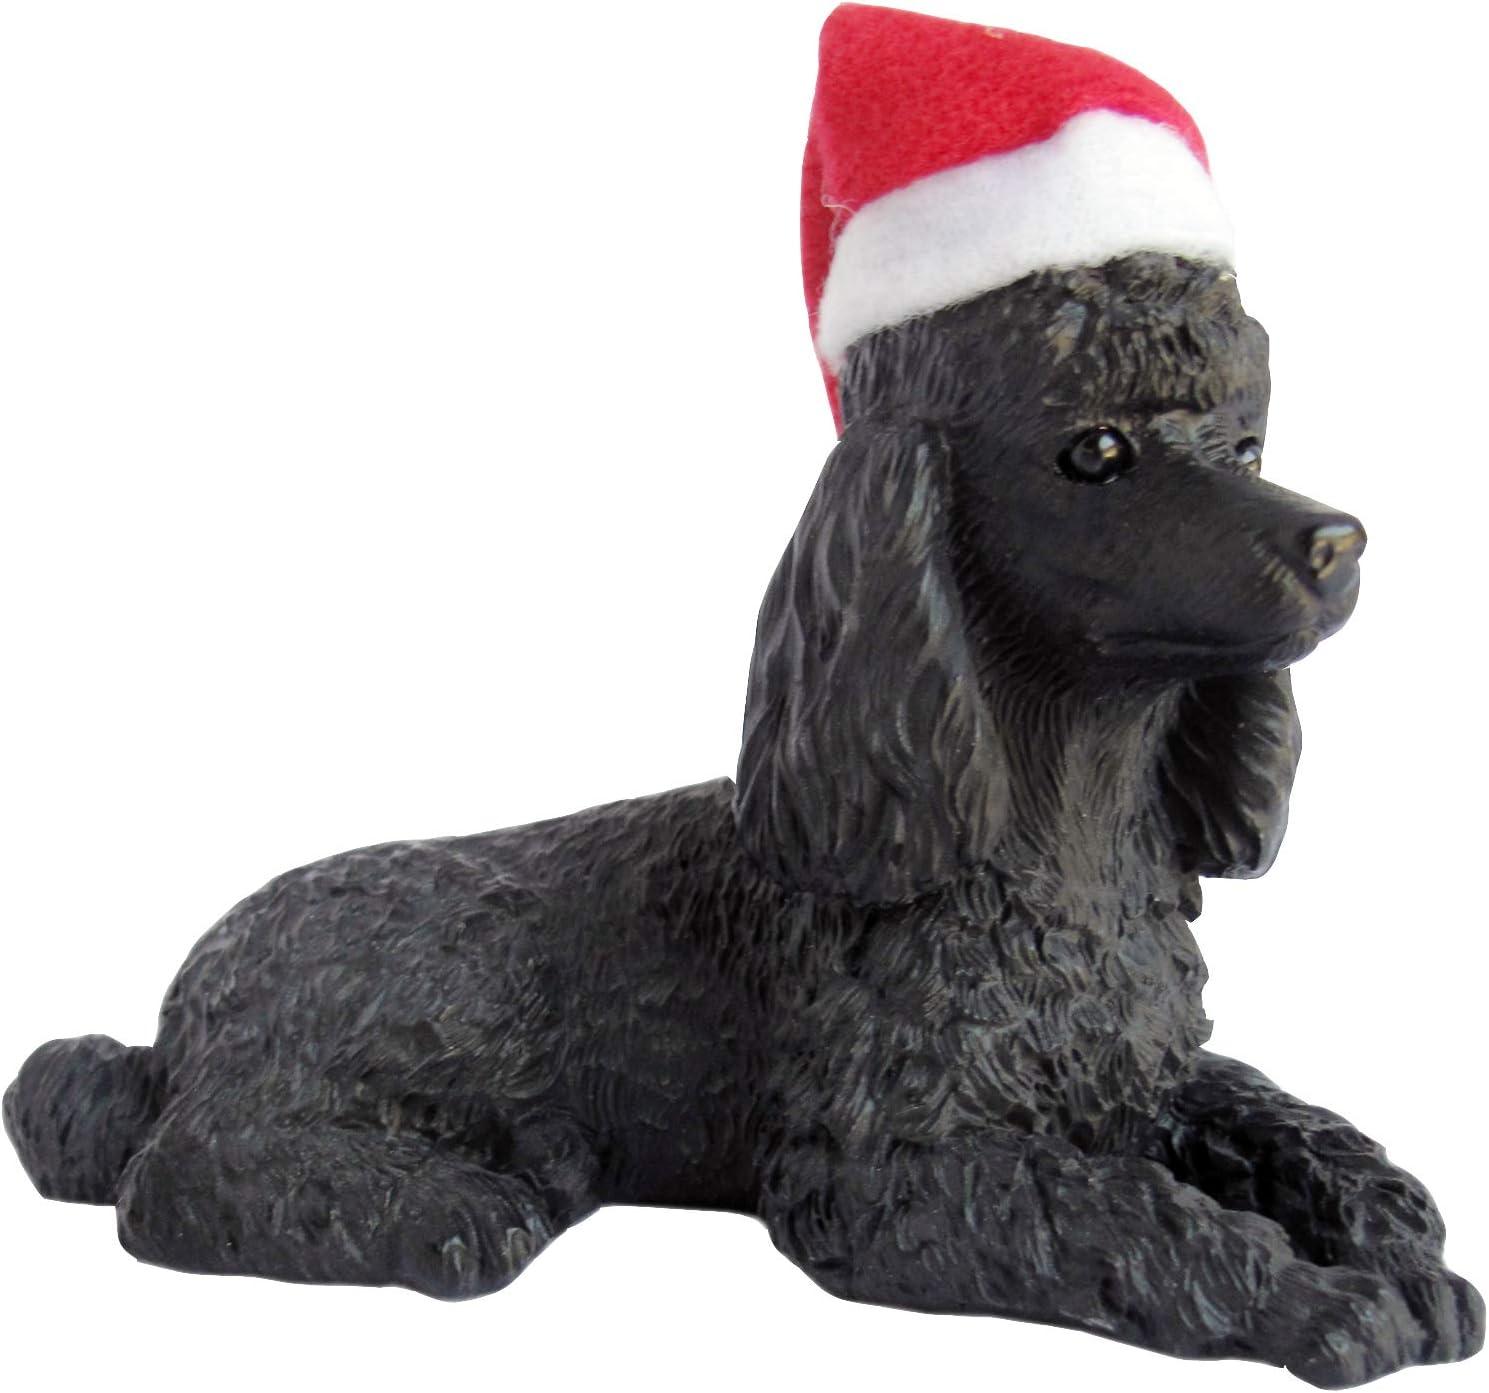 Sandicast Christmas Ornament, Black